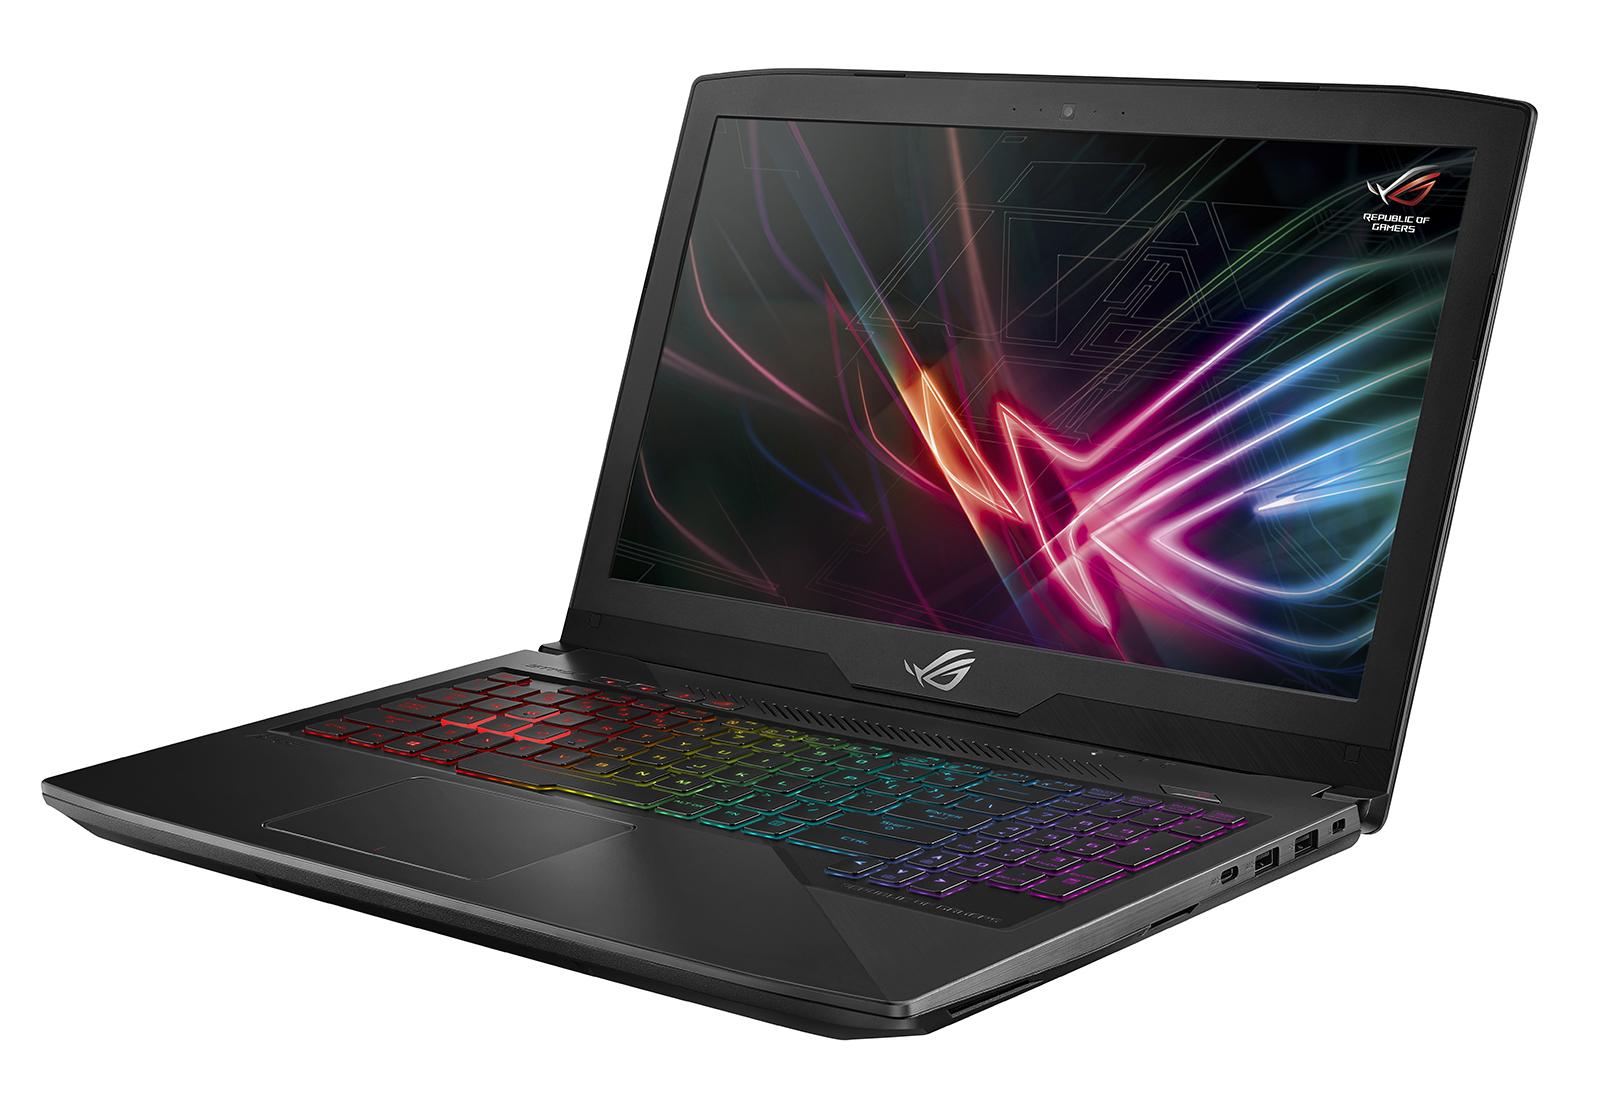 ASUS ROG Strix GL503VM-GZ159T Gaming Laptop Intel i7-7700HQ, Nvidia GTX 1060, 8GB RAM, 256GB M.2 SSD, 1TB HDD, Windows 10 image